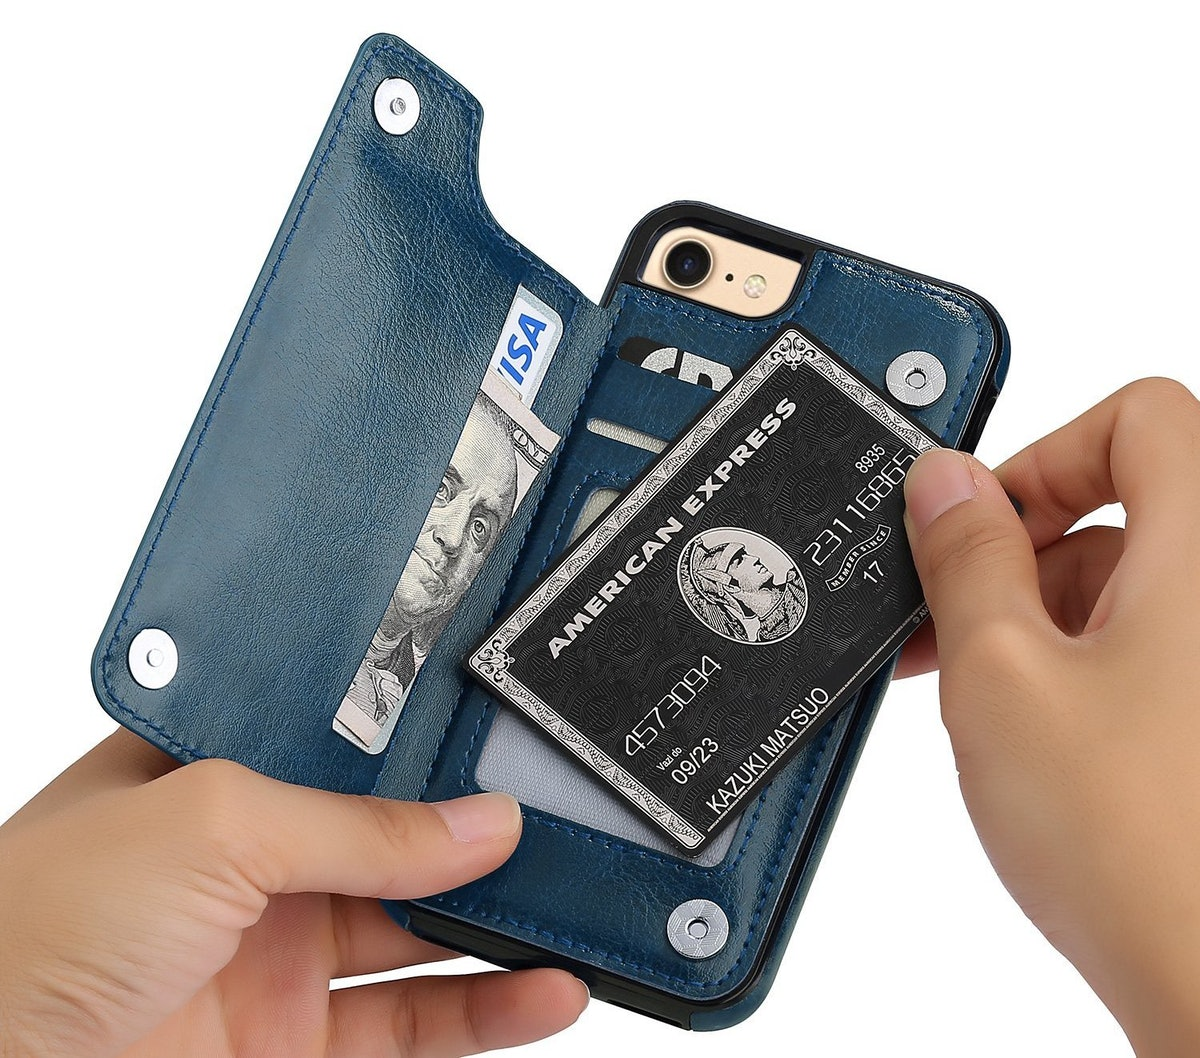 OT ONETOP Wallet Phone Case